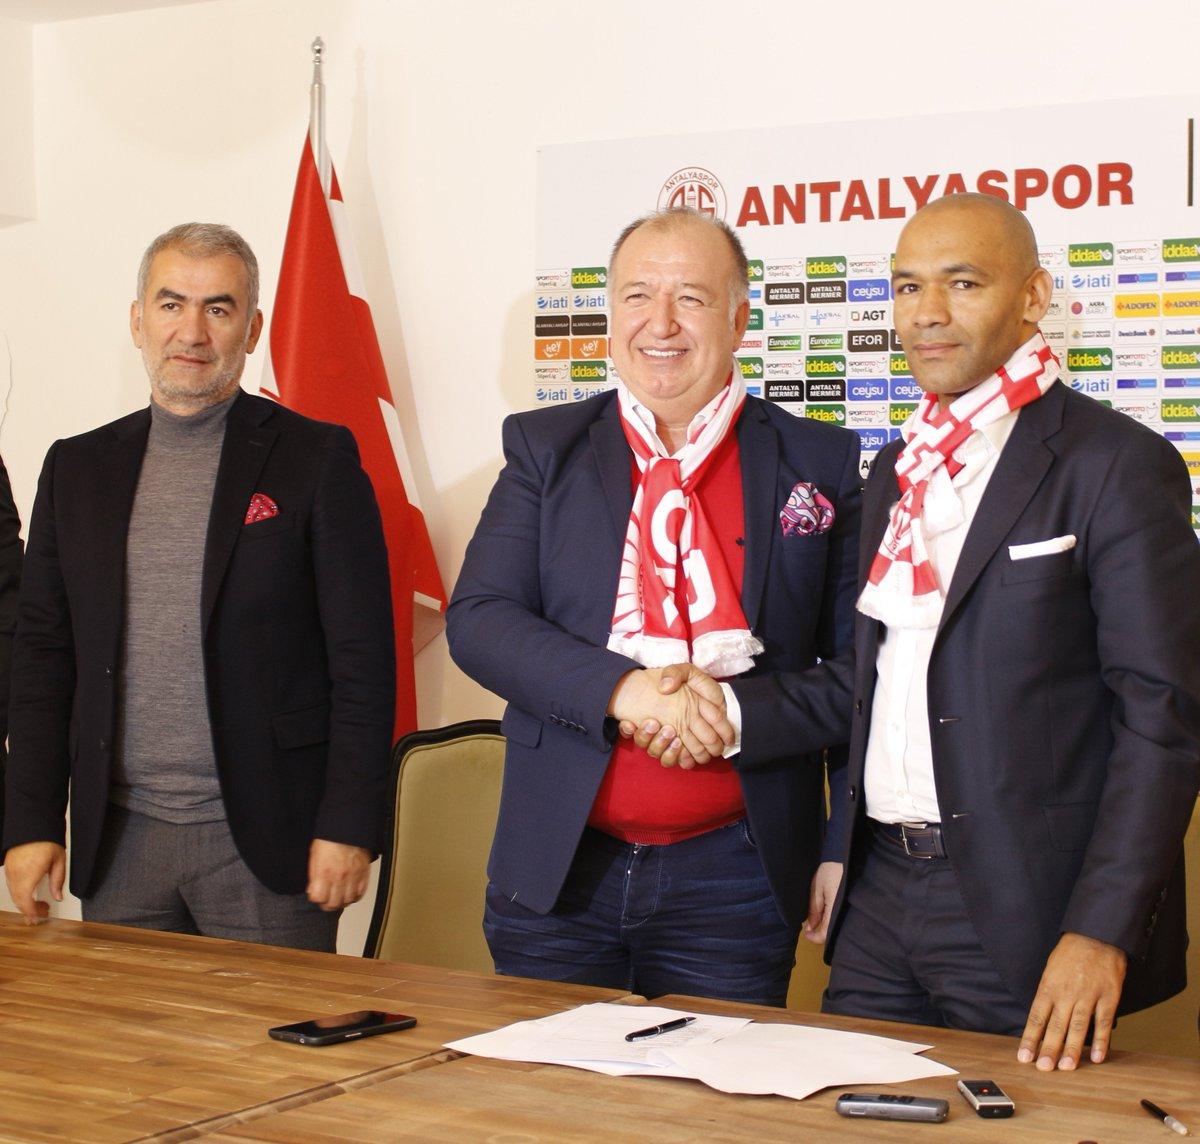 Eto'o lasts just FIVE games as Antalyspor manager